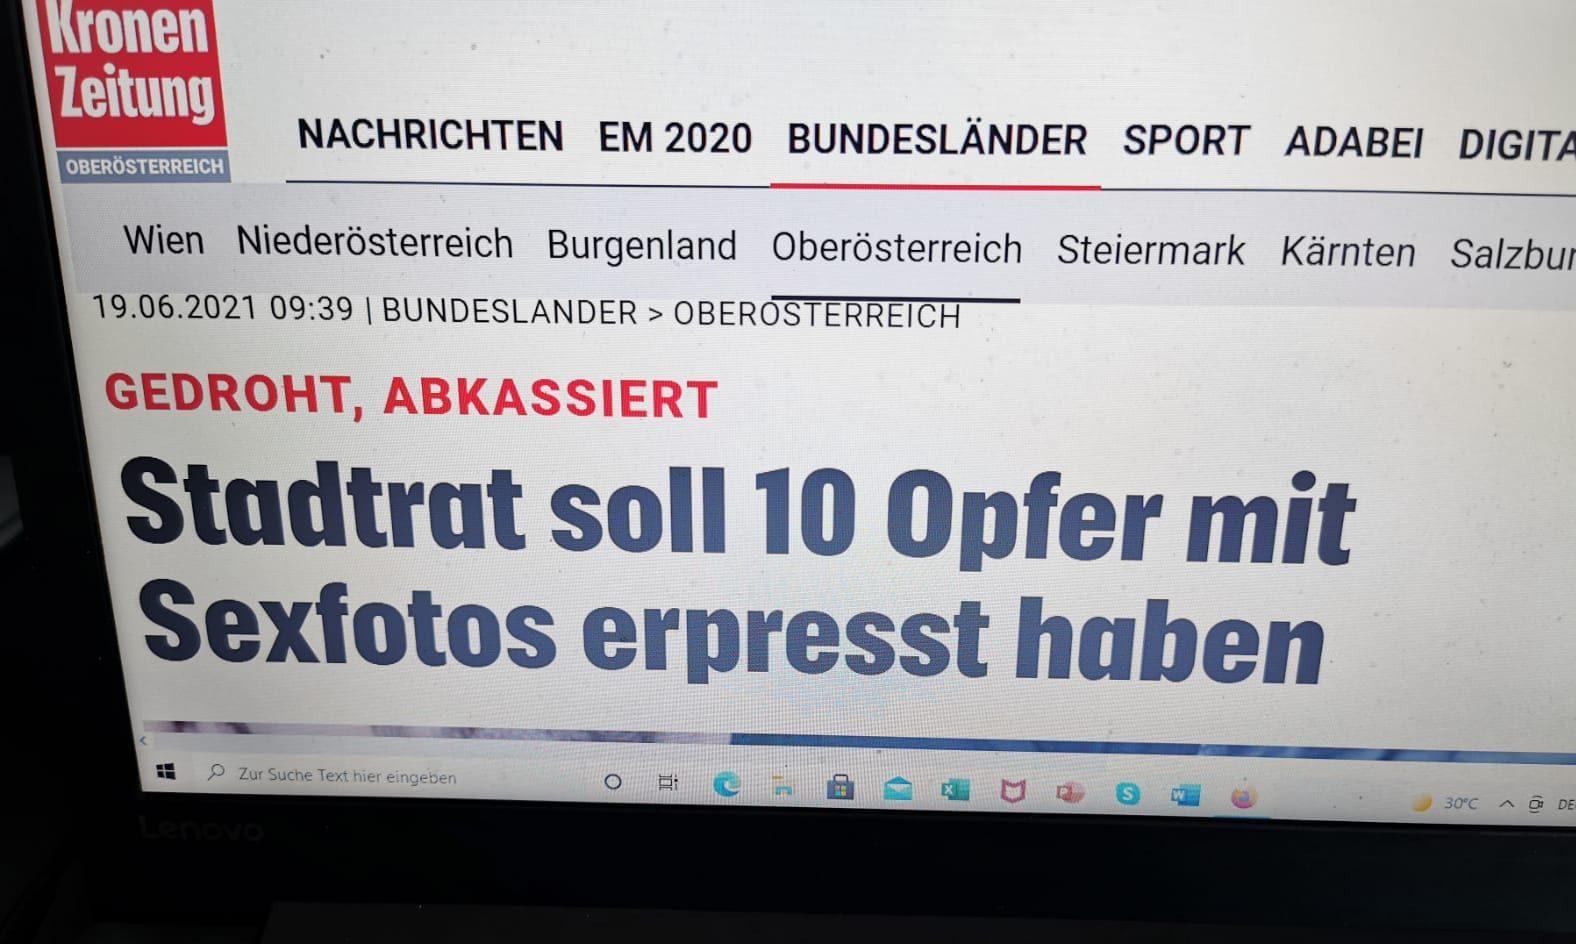 Screenshot / Kronen Zeitung